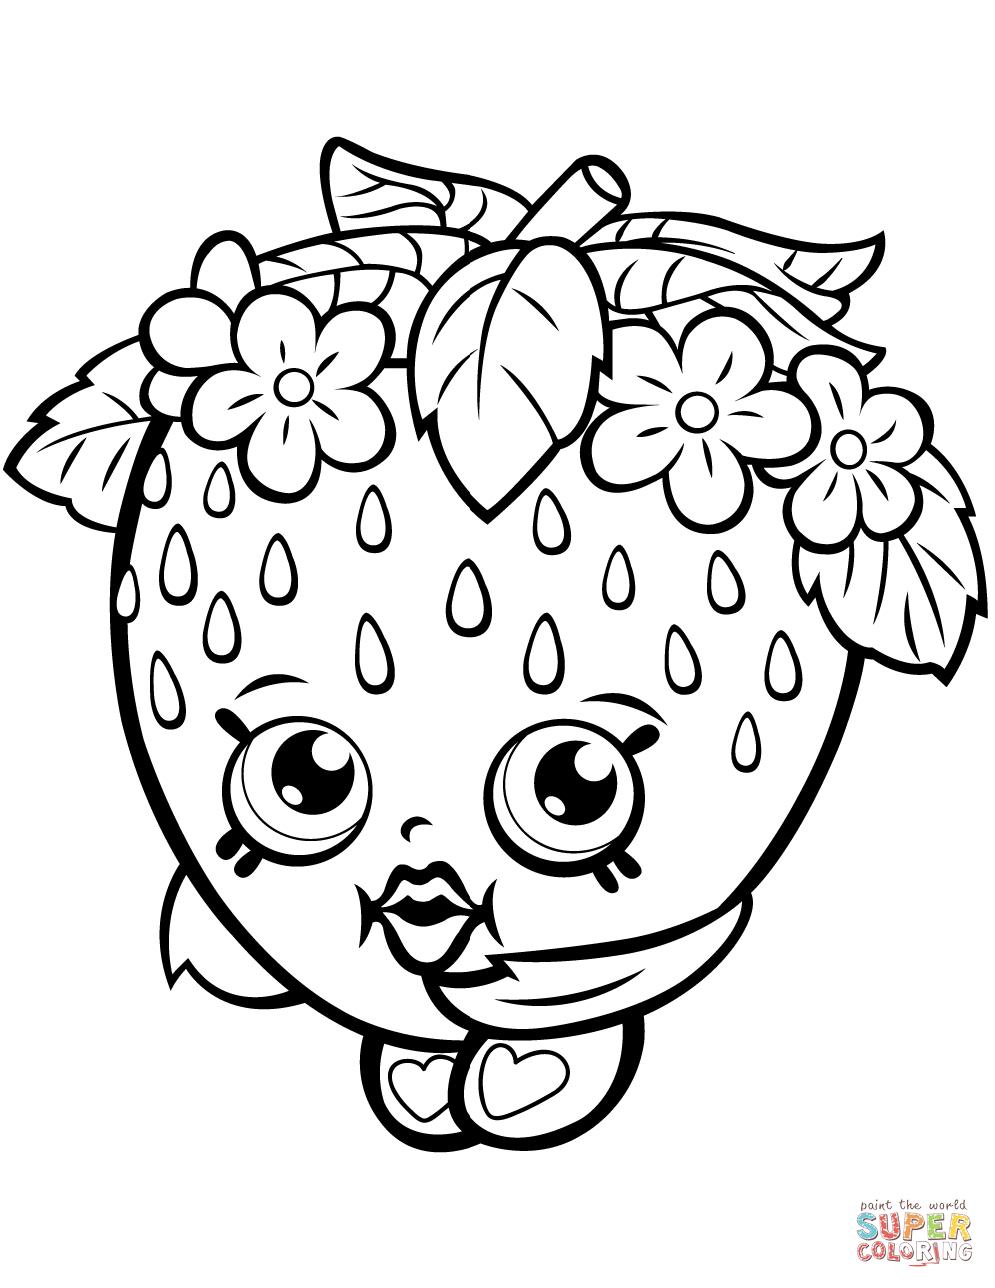 Strawberry Kiss Shopkin Coloring Page | Free Printable Coloring - Shopkins Coloring Pages Free Printable